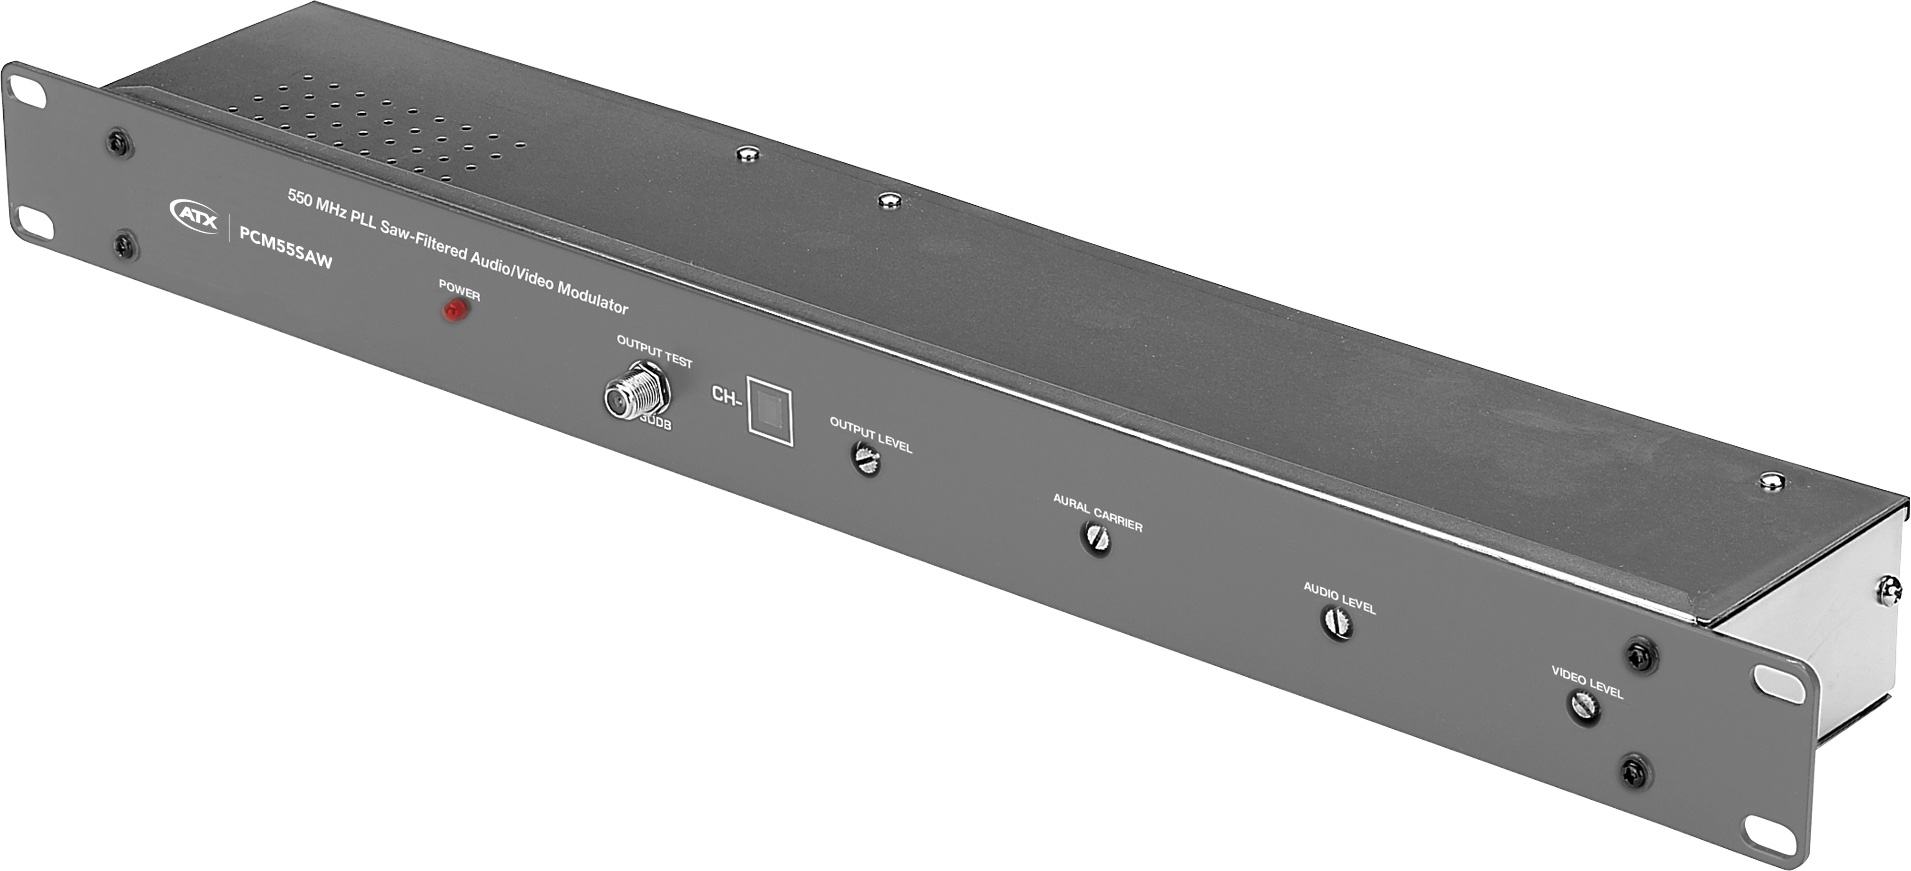 1 Channel Crystal A/V Modulator - Channel A PM-PCM55SAW-A